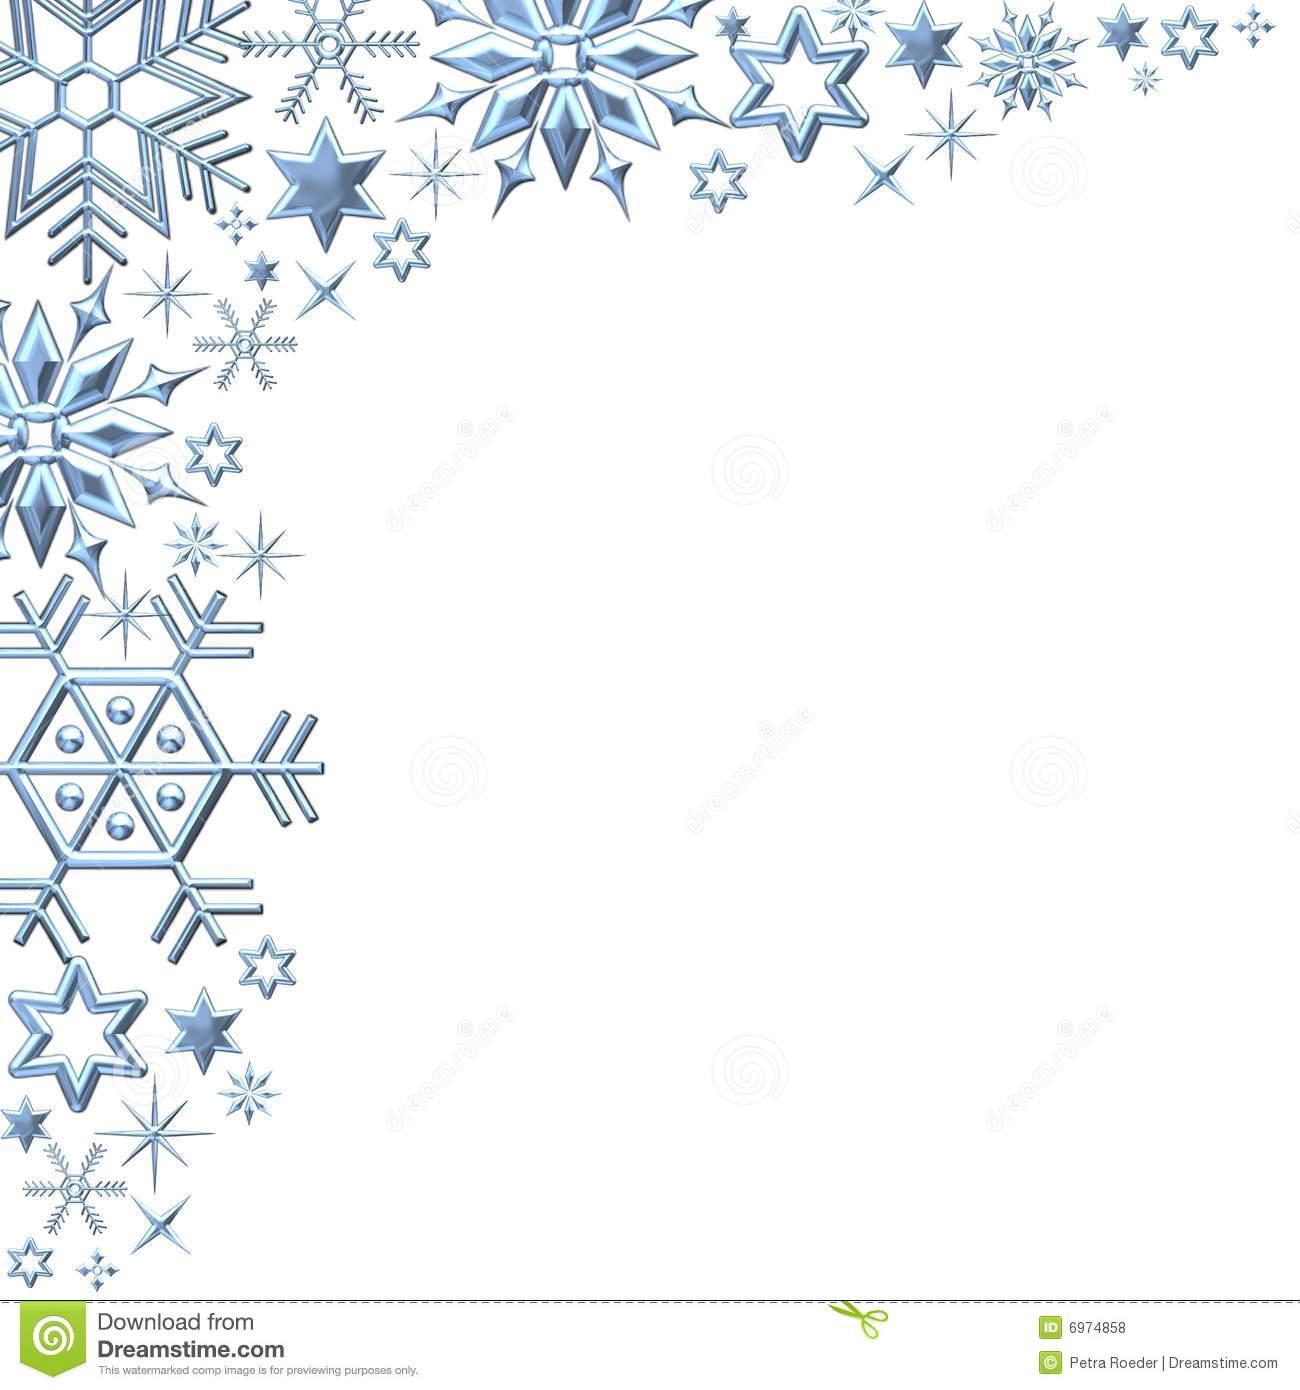 Printable Winter Border Clipart #1